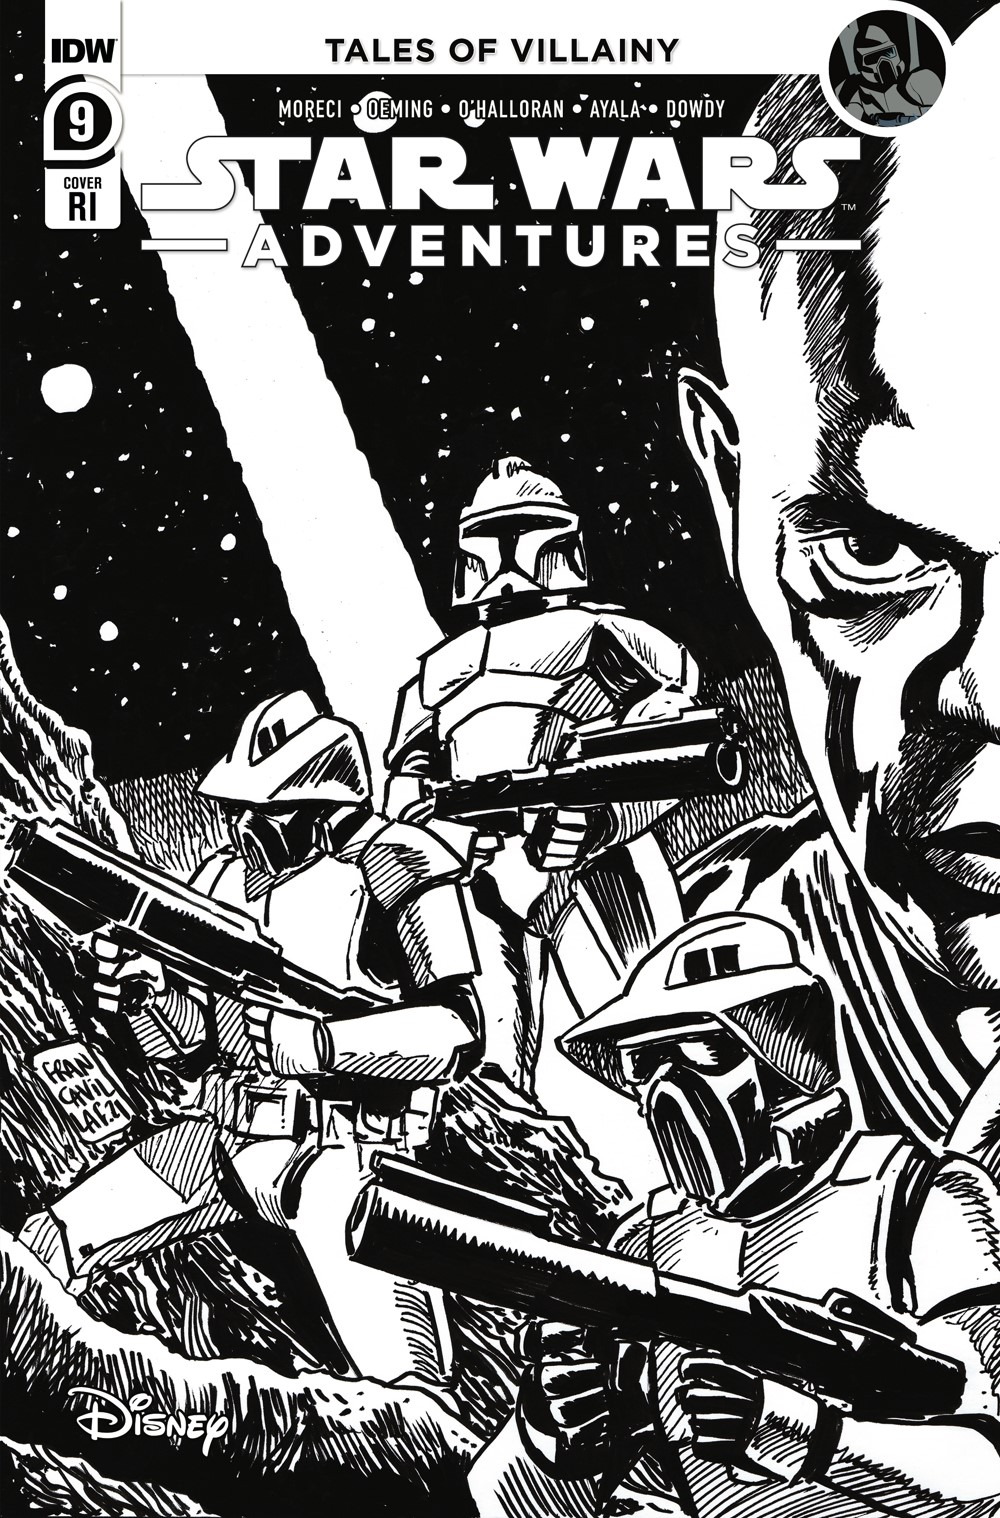 SWA-09-Cover-RI ComicList Previews: STAR WARS ADVENTURES VOLUME 2 #9